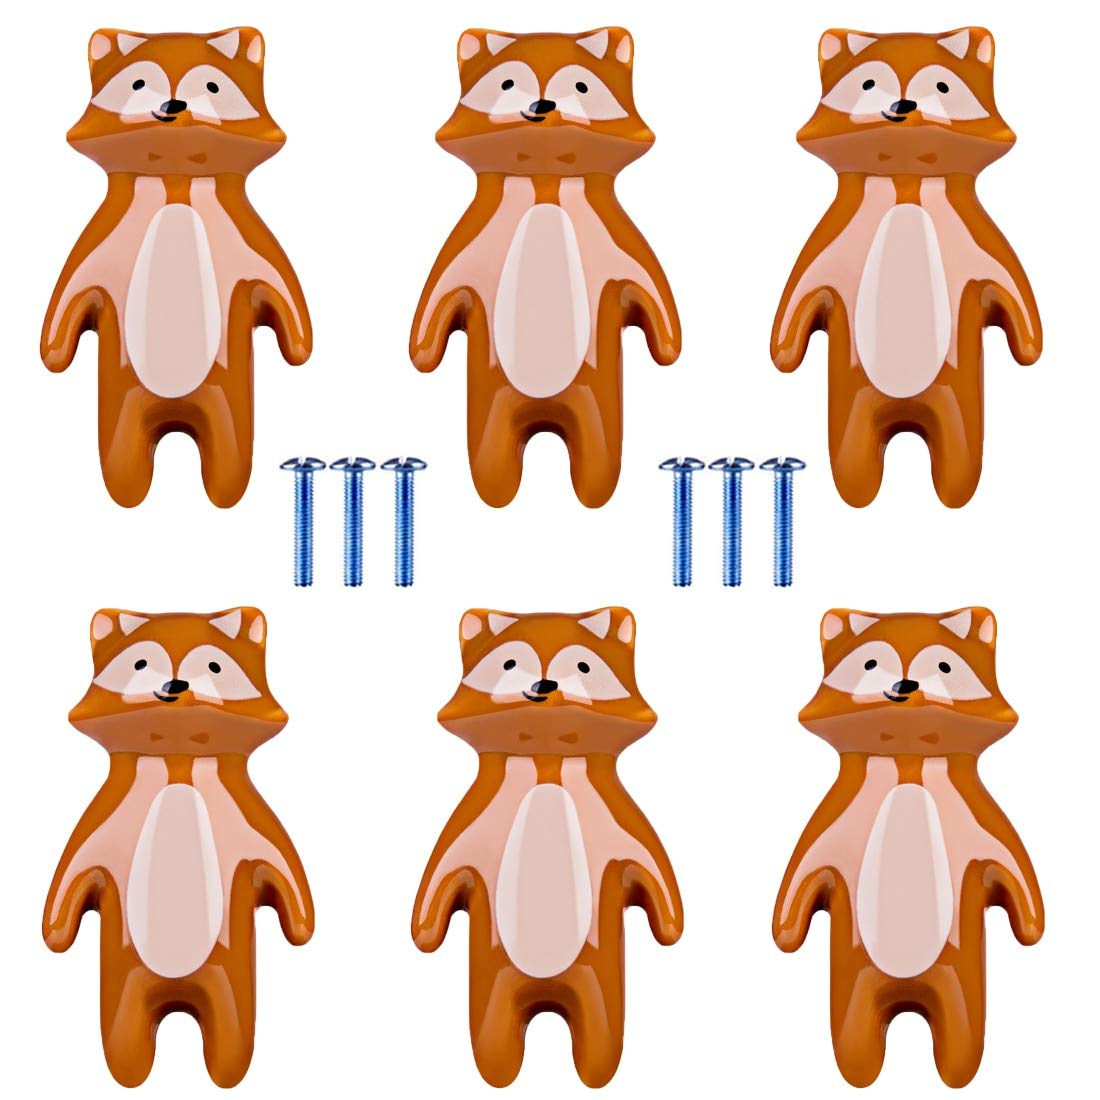 Nursery Dresser Knobs 2019 New Arrival 6pcs/Lot Children Cartoon Door Knob Ceramic Fox Animal Shape Handle Furniture Handle Cabinet Pull Handle Knobs by AloPW